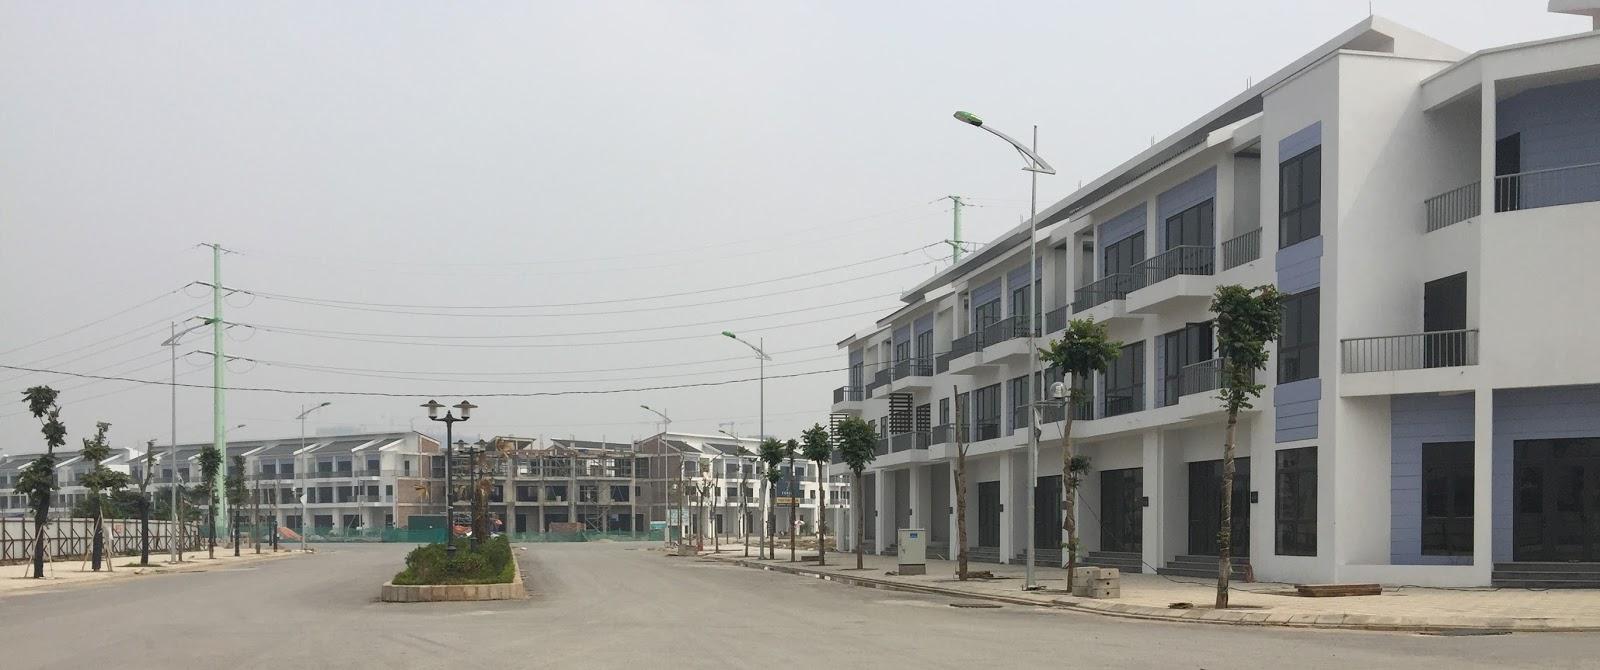 tasco-xuan-phuong-khu-nha-pho